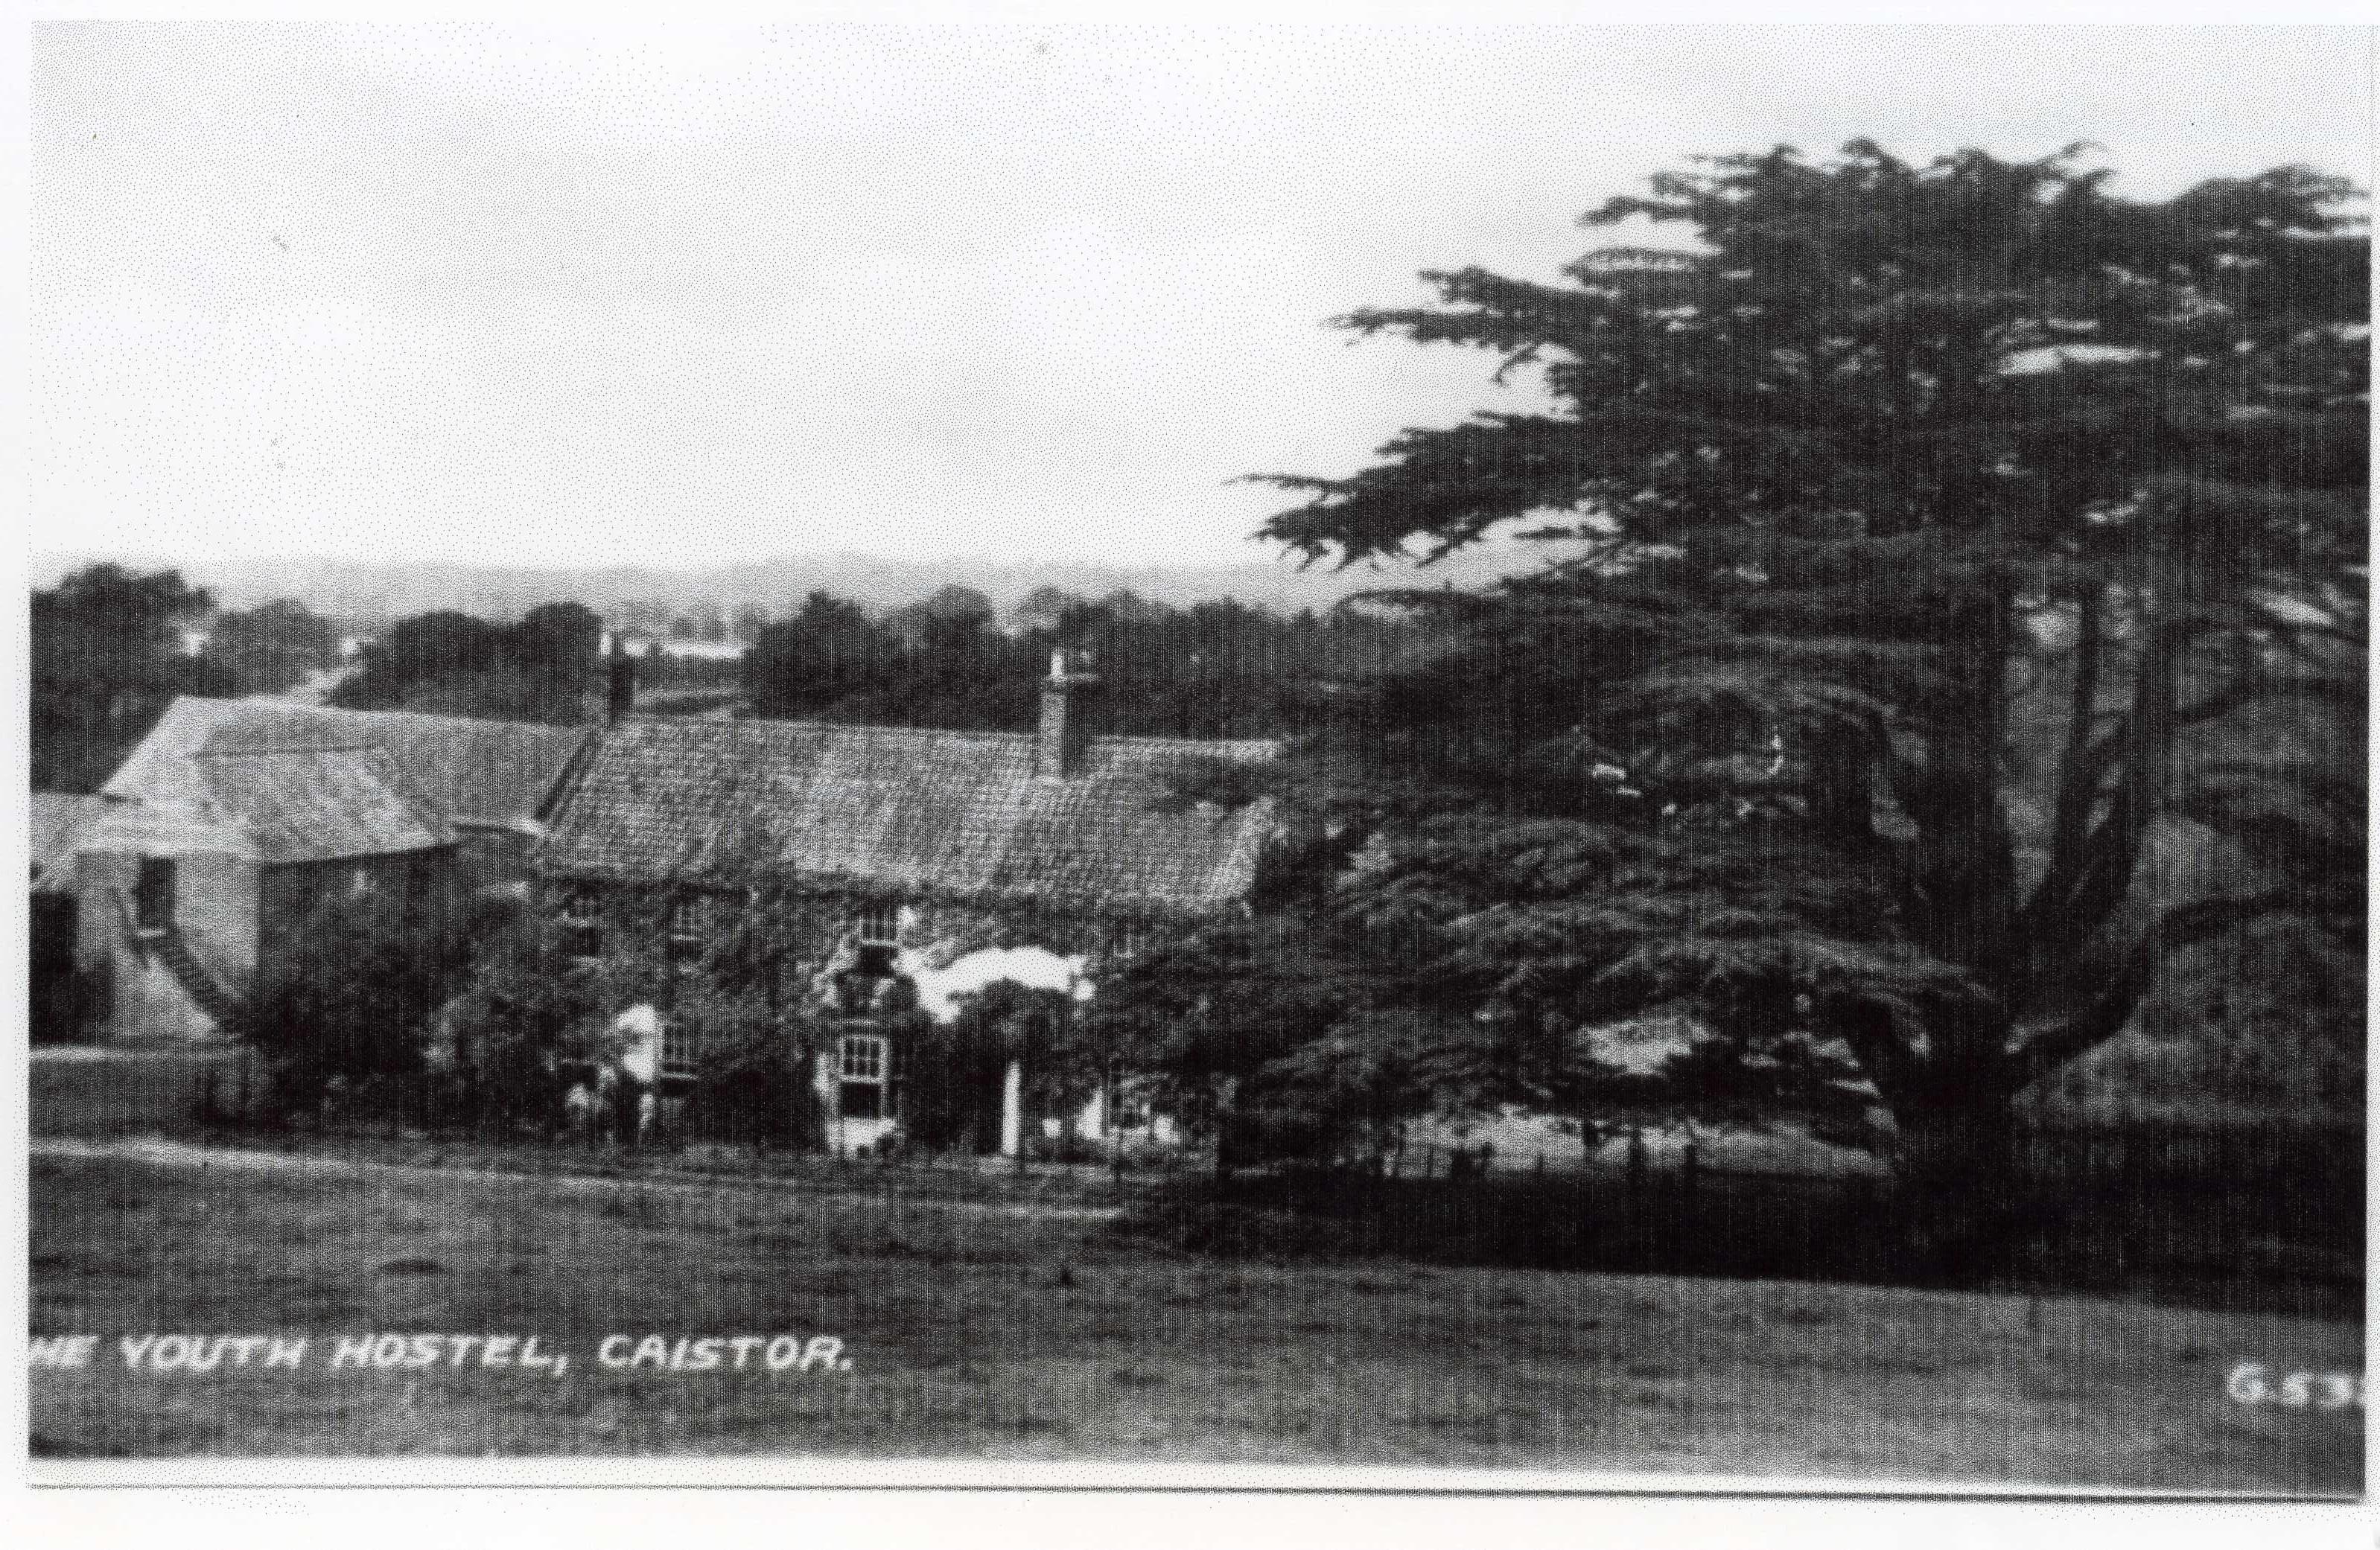 Youth Hostel Caistor